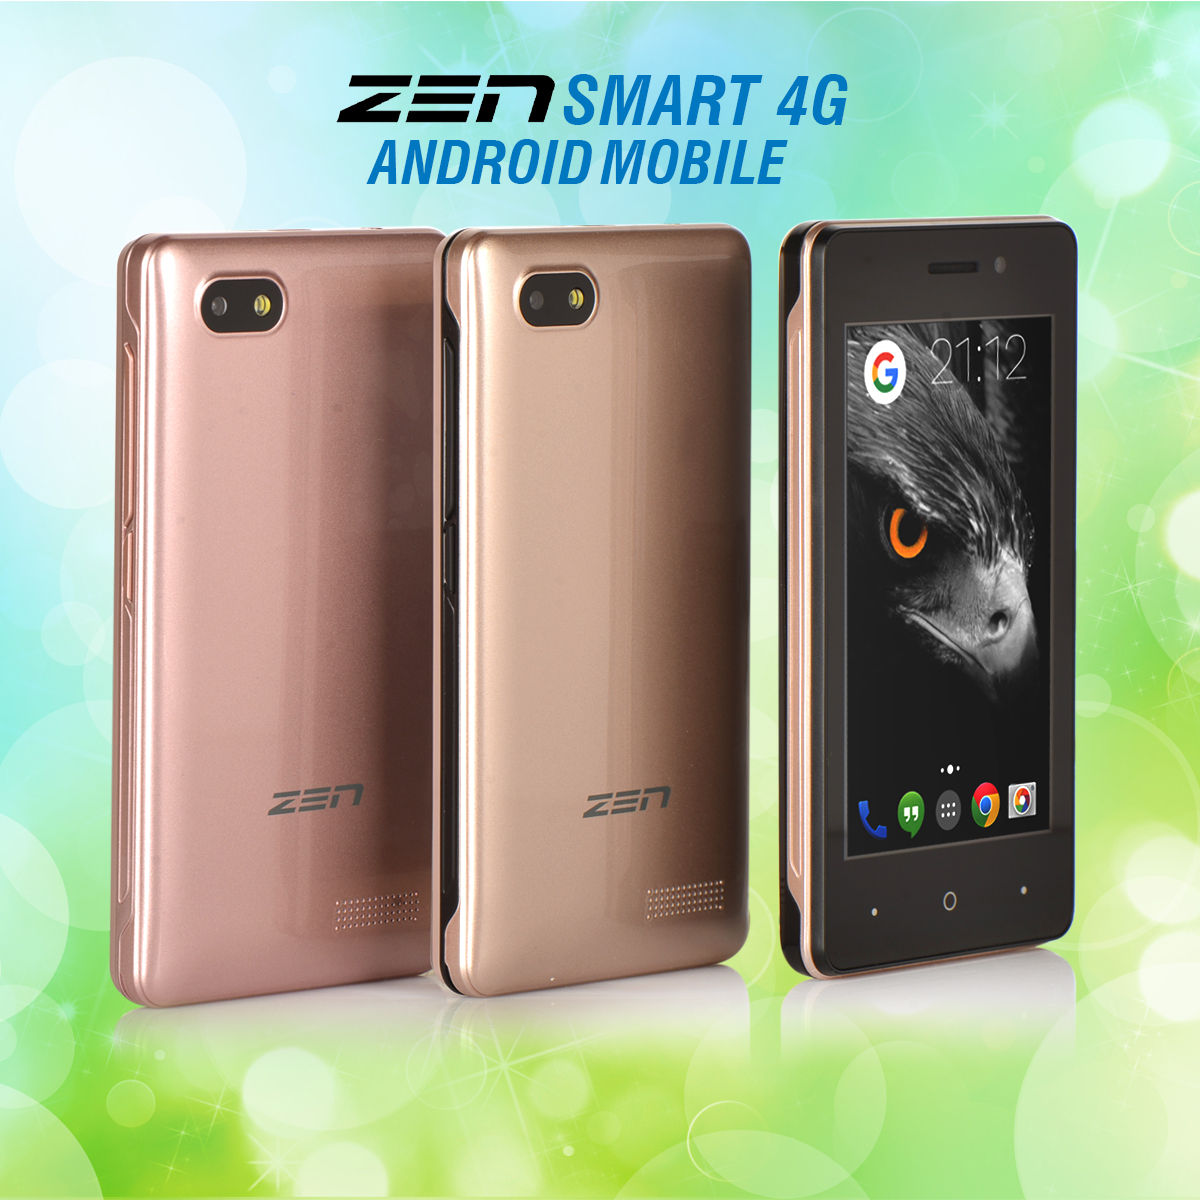 buy zen smart 4g android mobile online at best price in india on. Black Bedroom Furniture Sets. Home Design Ideas